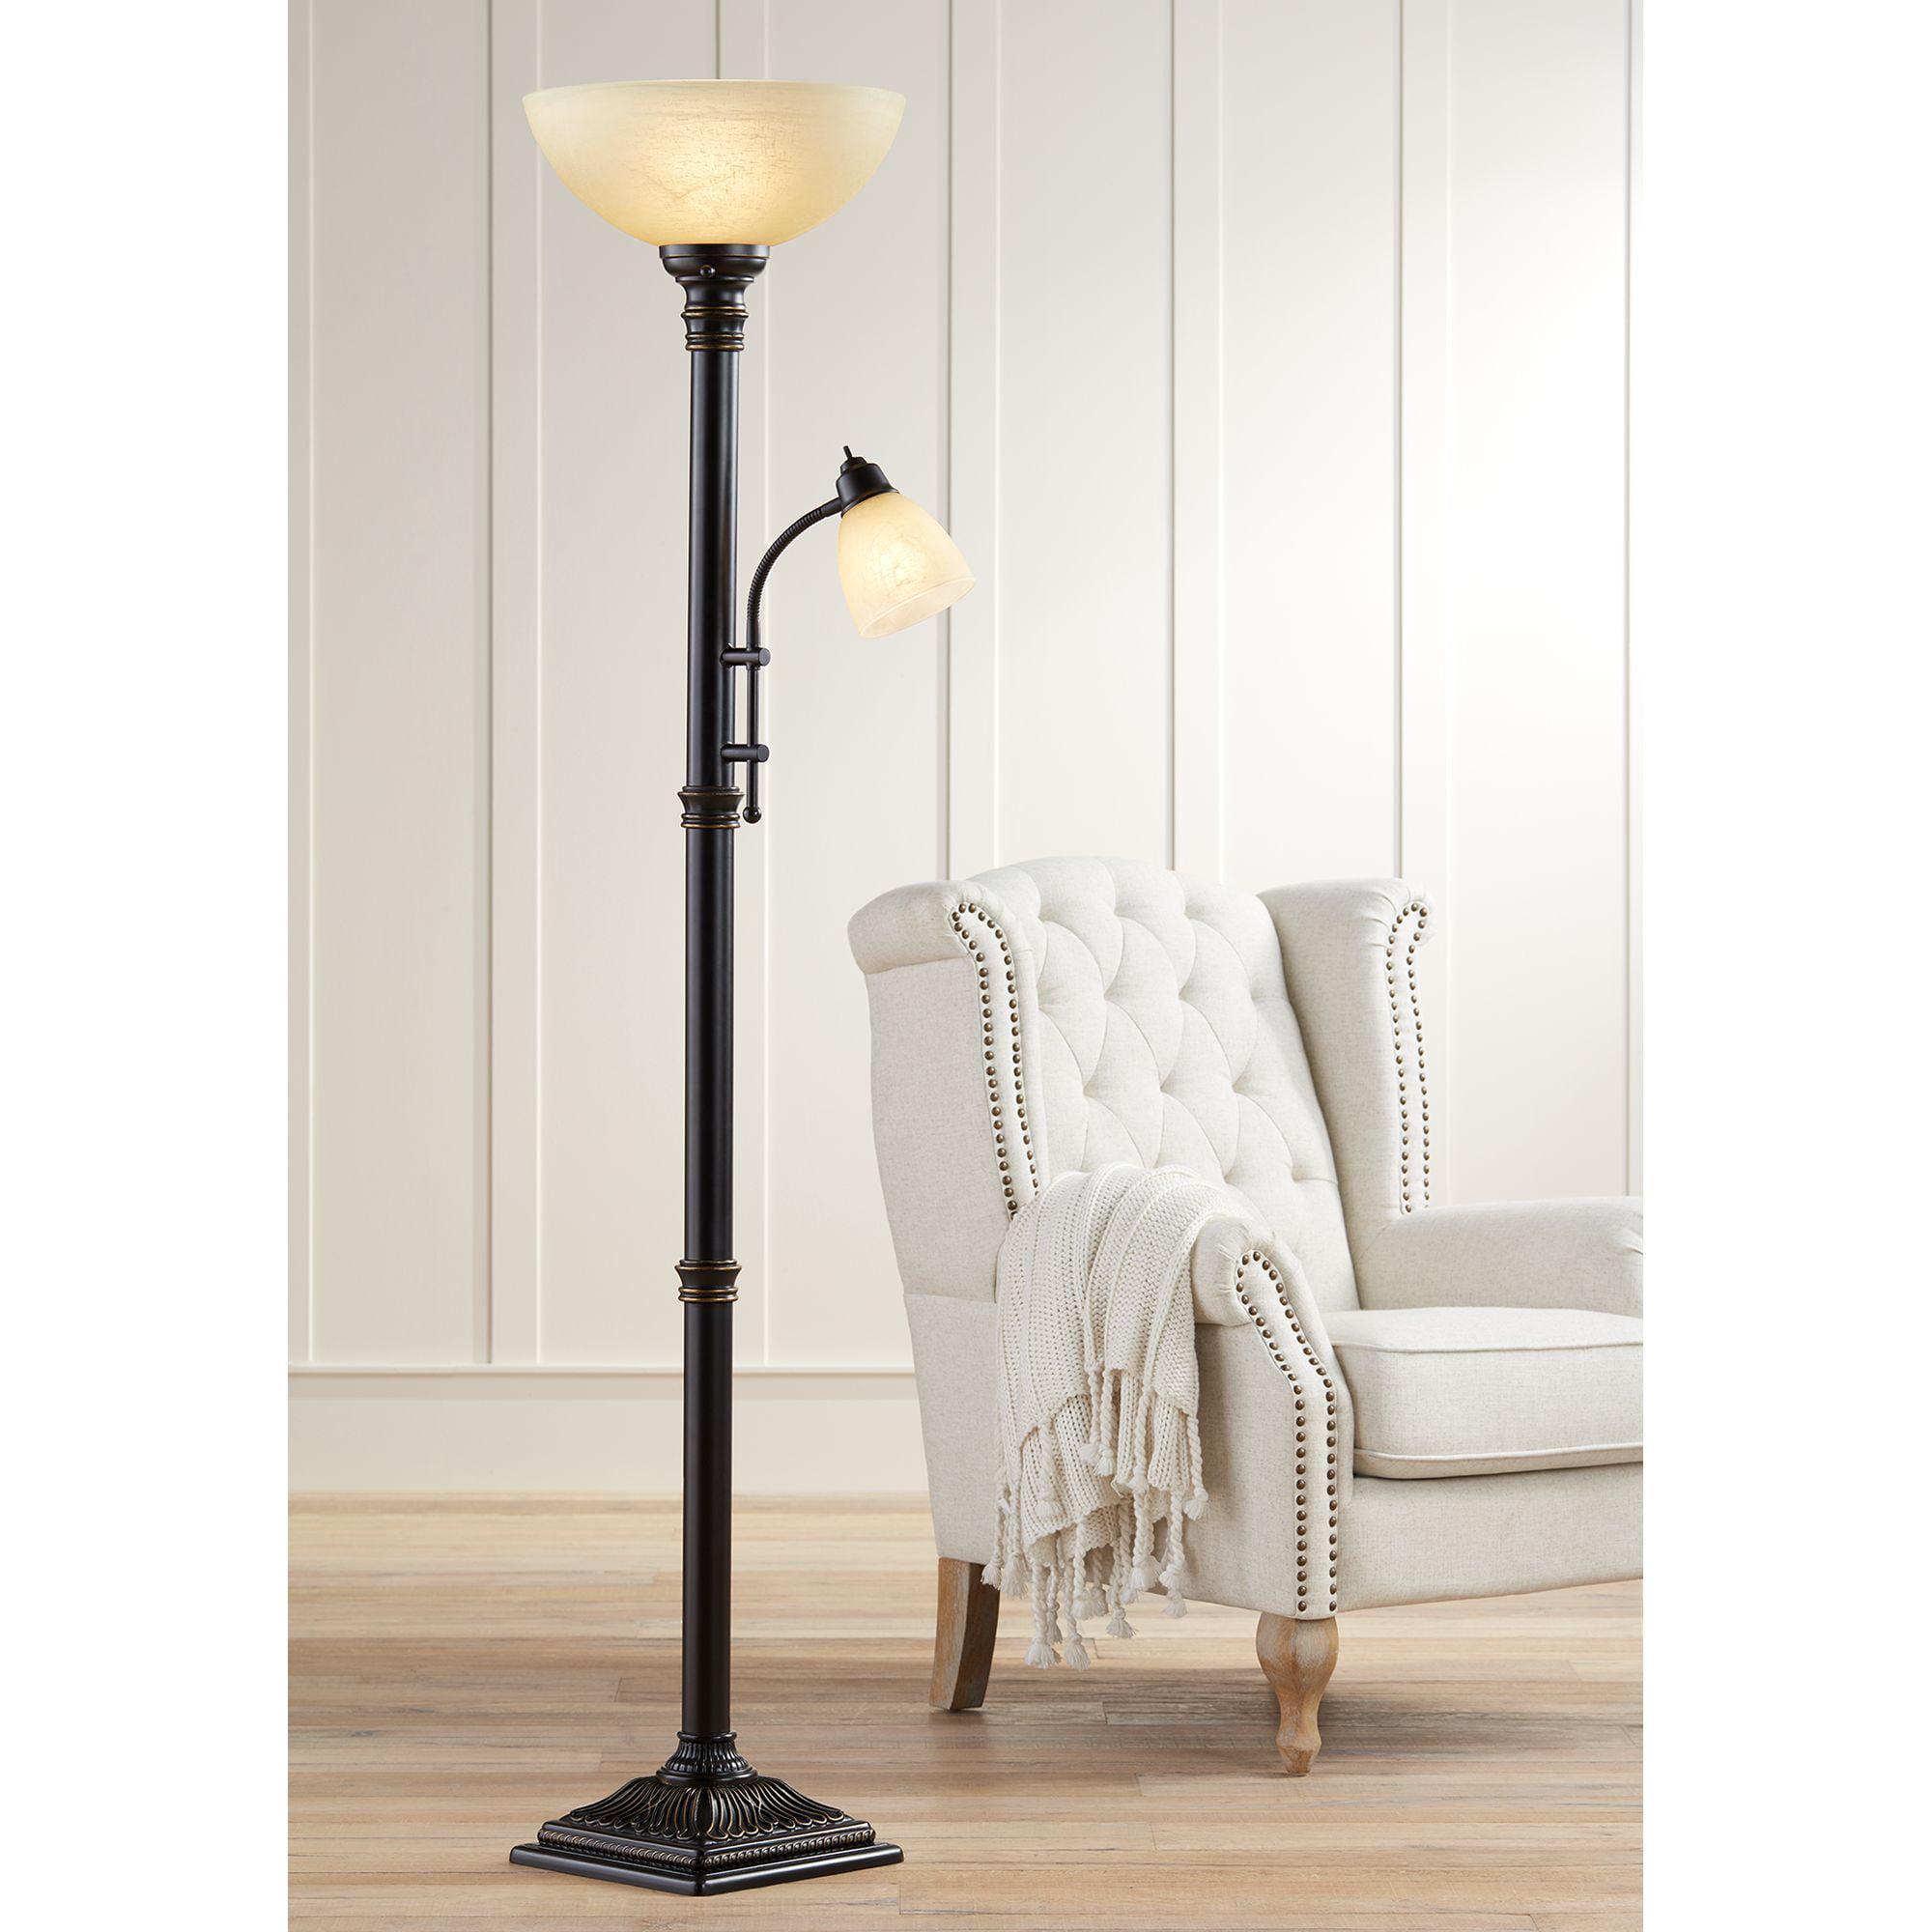 Regency Hill Garver Bronze Torchiere Floor Lamp With Reader Arm by Regency Hill